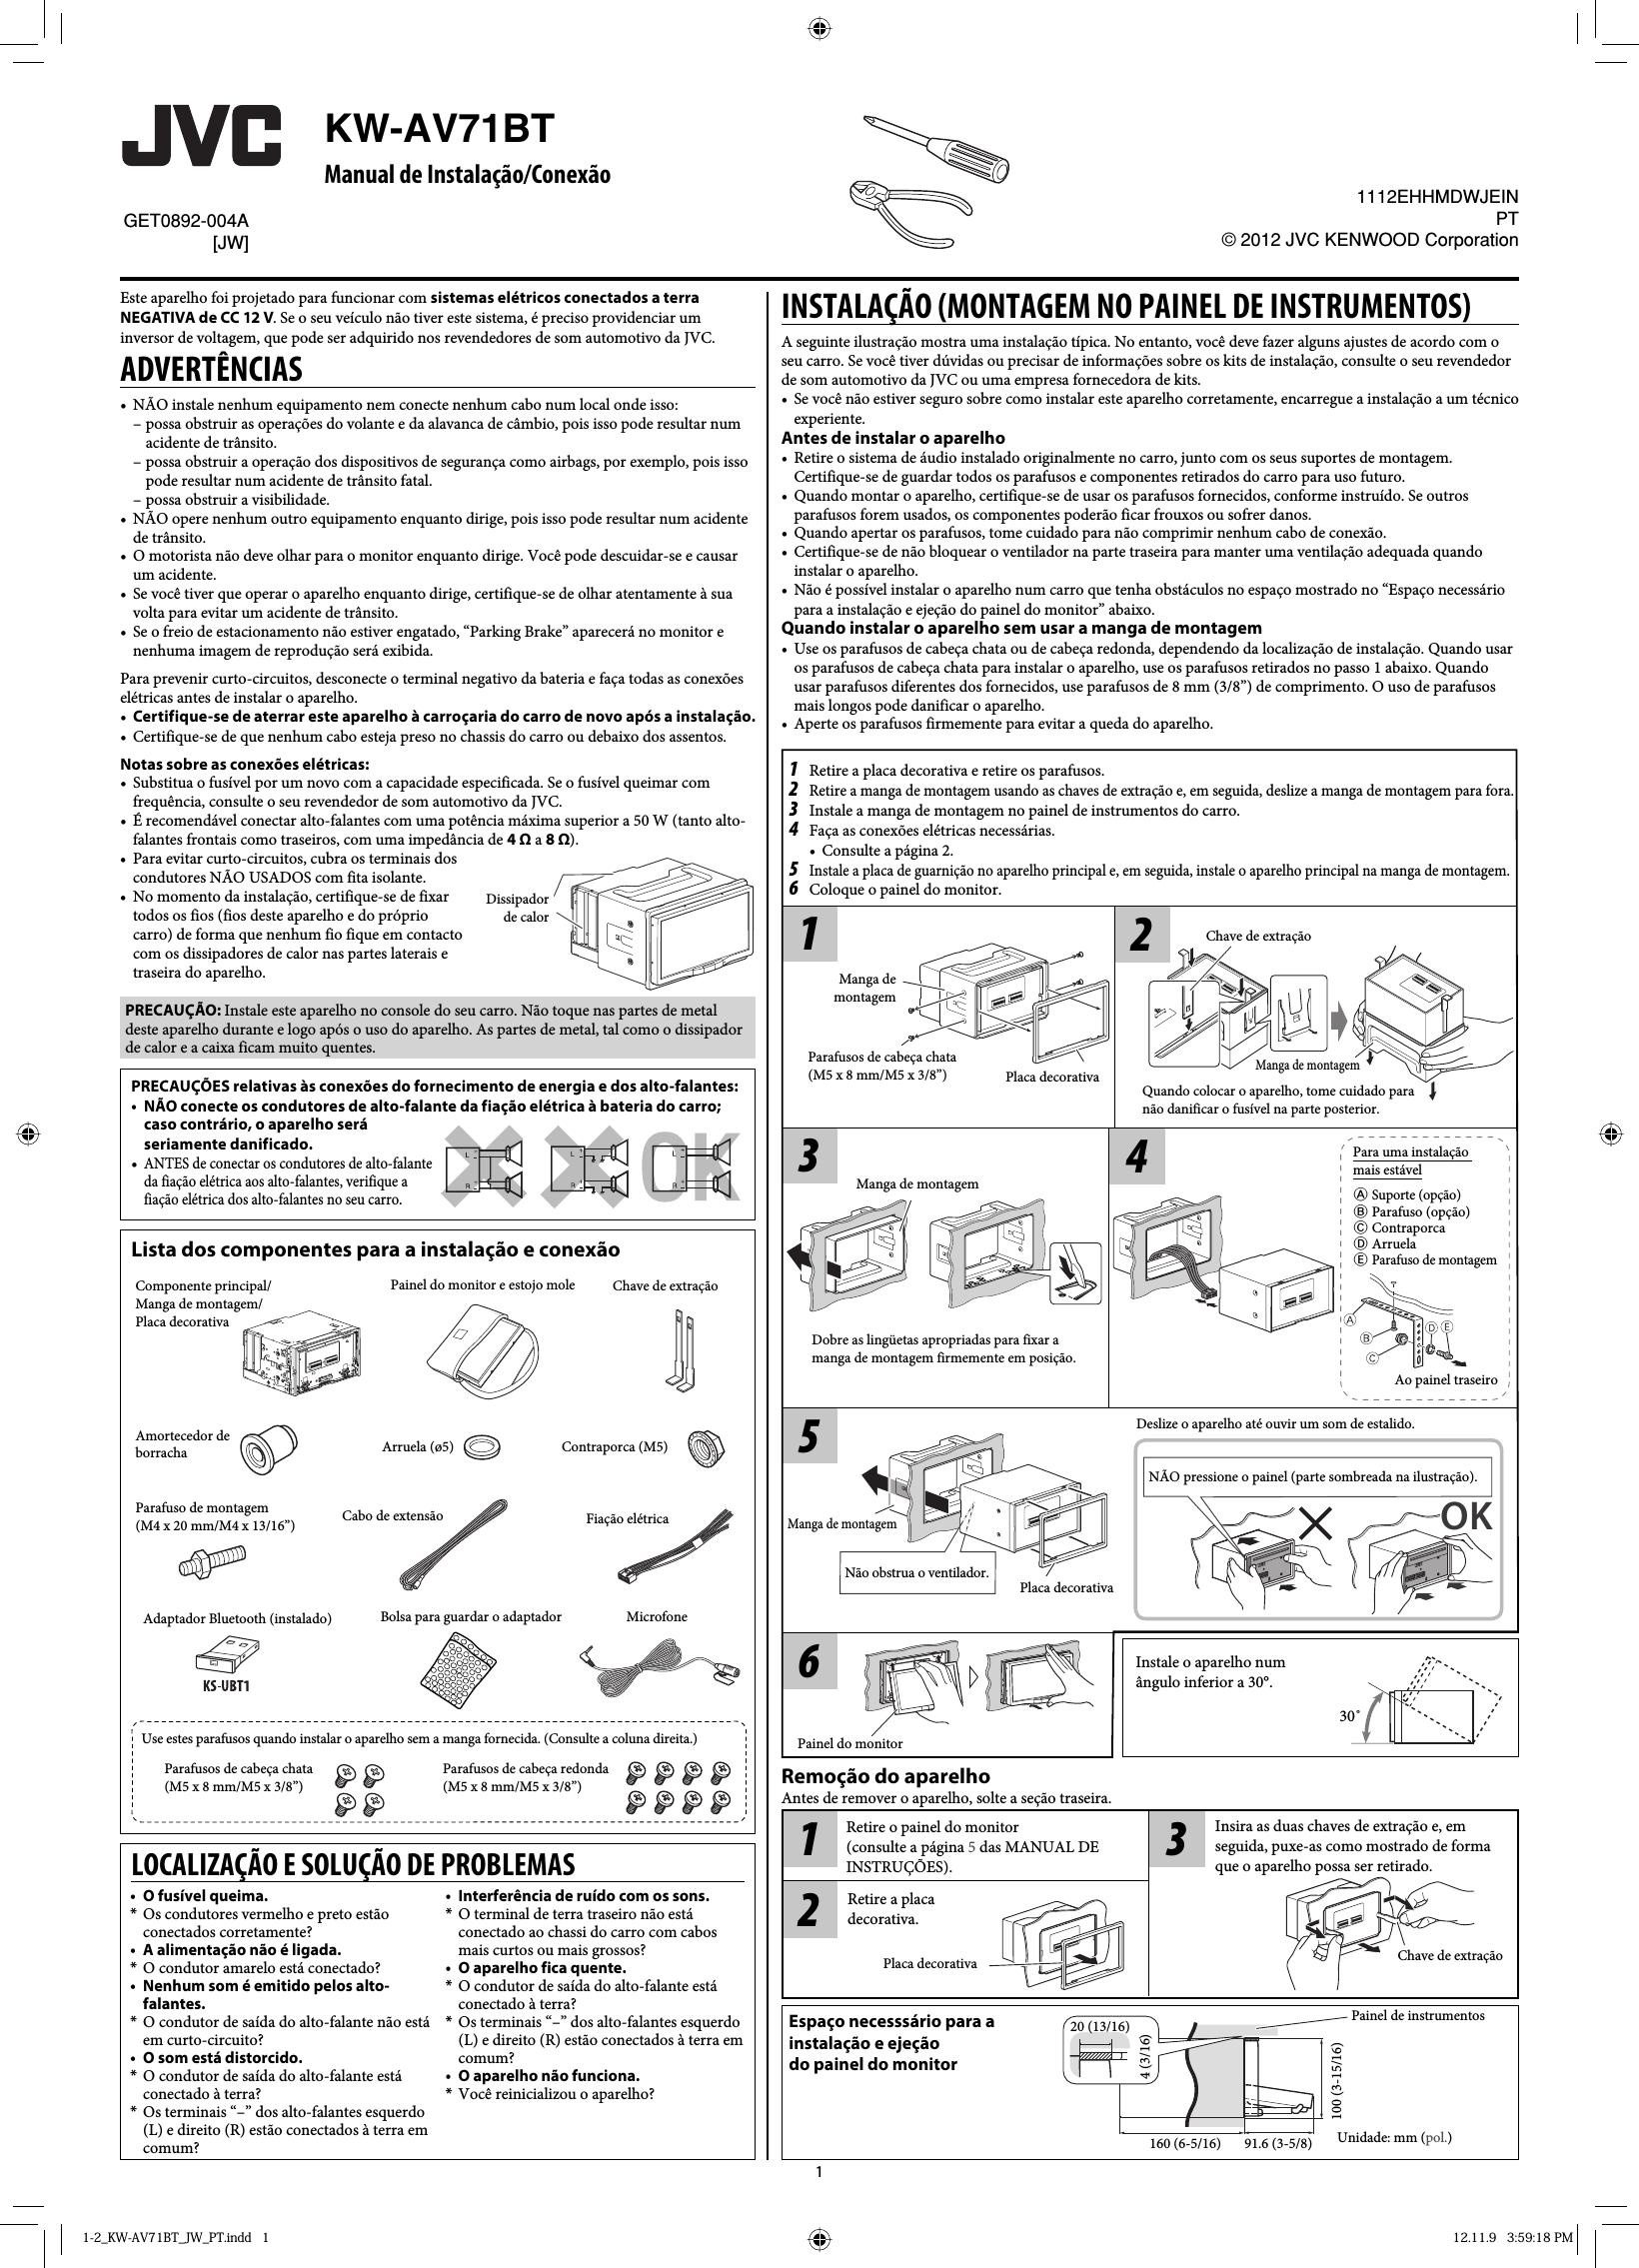 Jvc Kw Av71bt Wiring Diagram Electrical Diagrams 18 Av71btjw User Manual De Instala O Dvd Car Stereo Parts